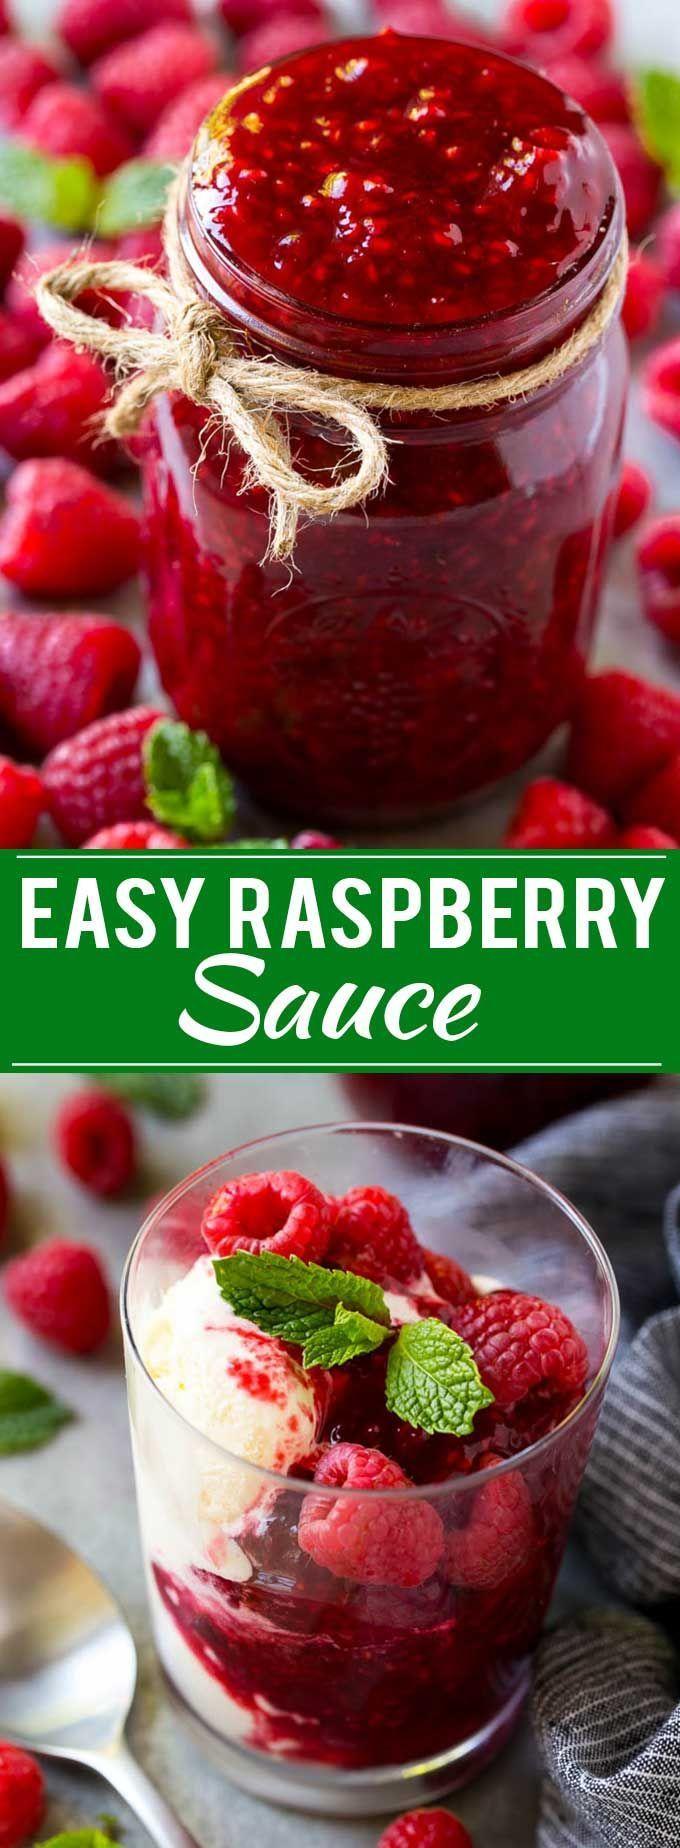 Raspberry Sauce Recipe | Homemade Raspberry Sauce | Raspberry Recipe #raspberrie…